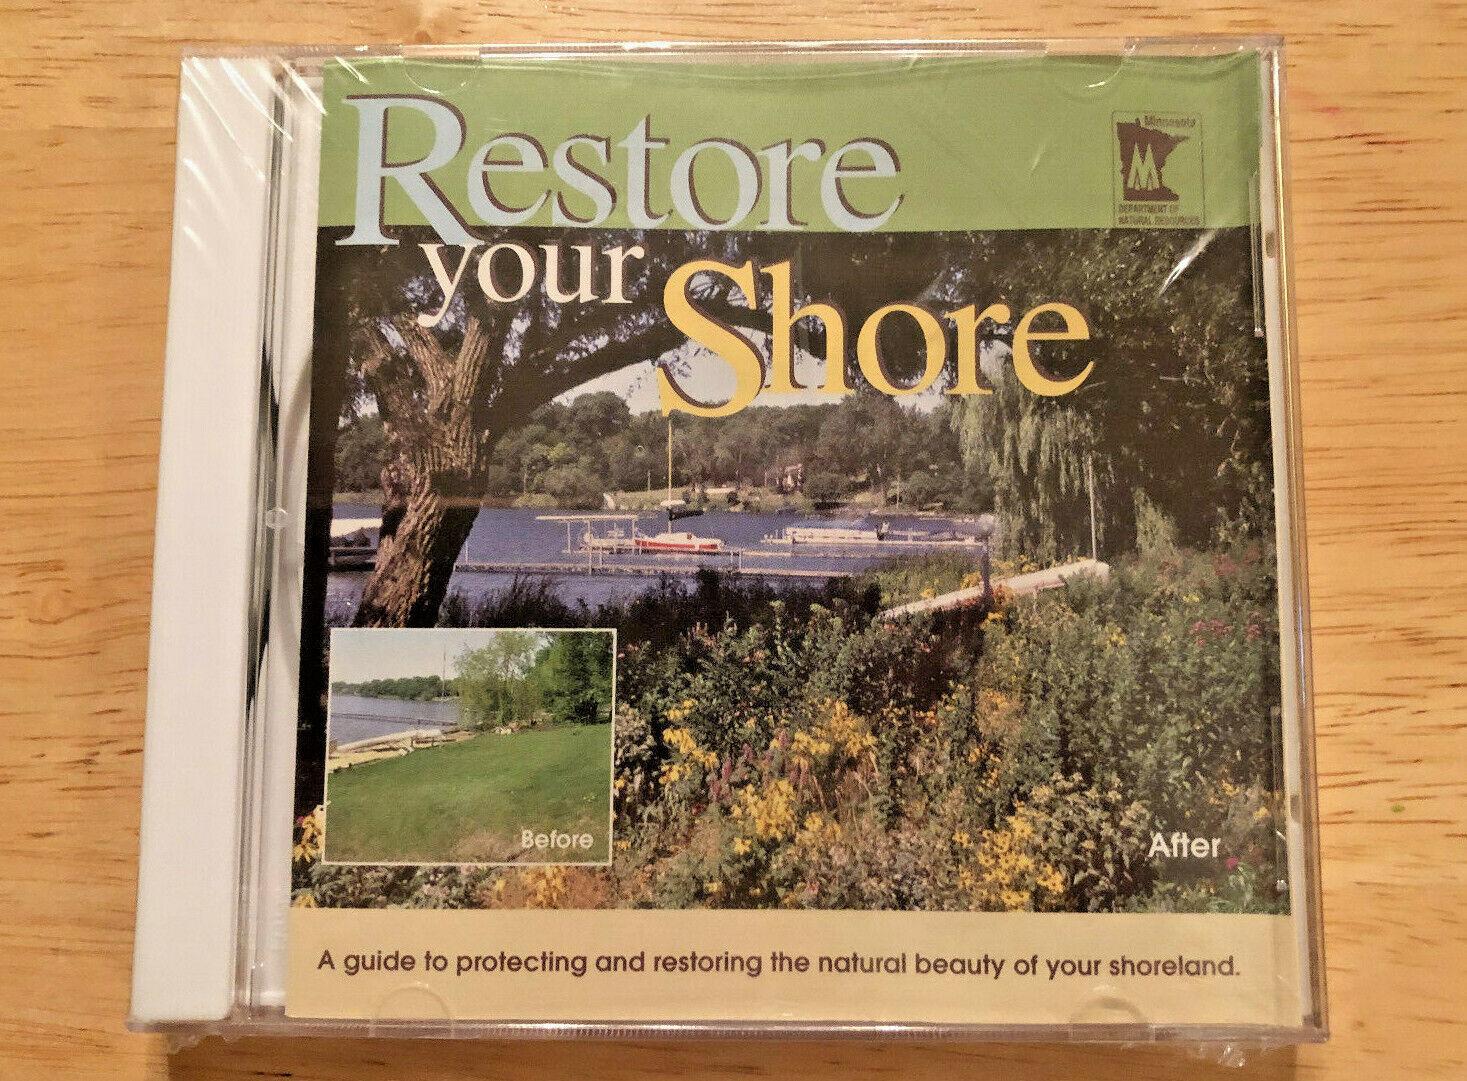 Restore Your Shoreline CD 2002 Minnesota Department Natural Resources - $9.95